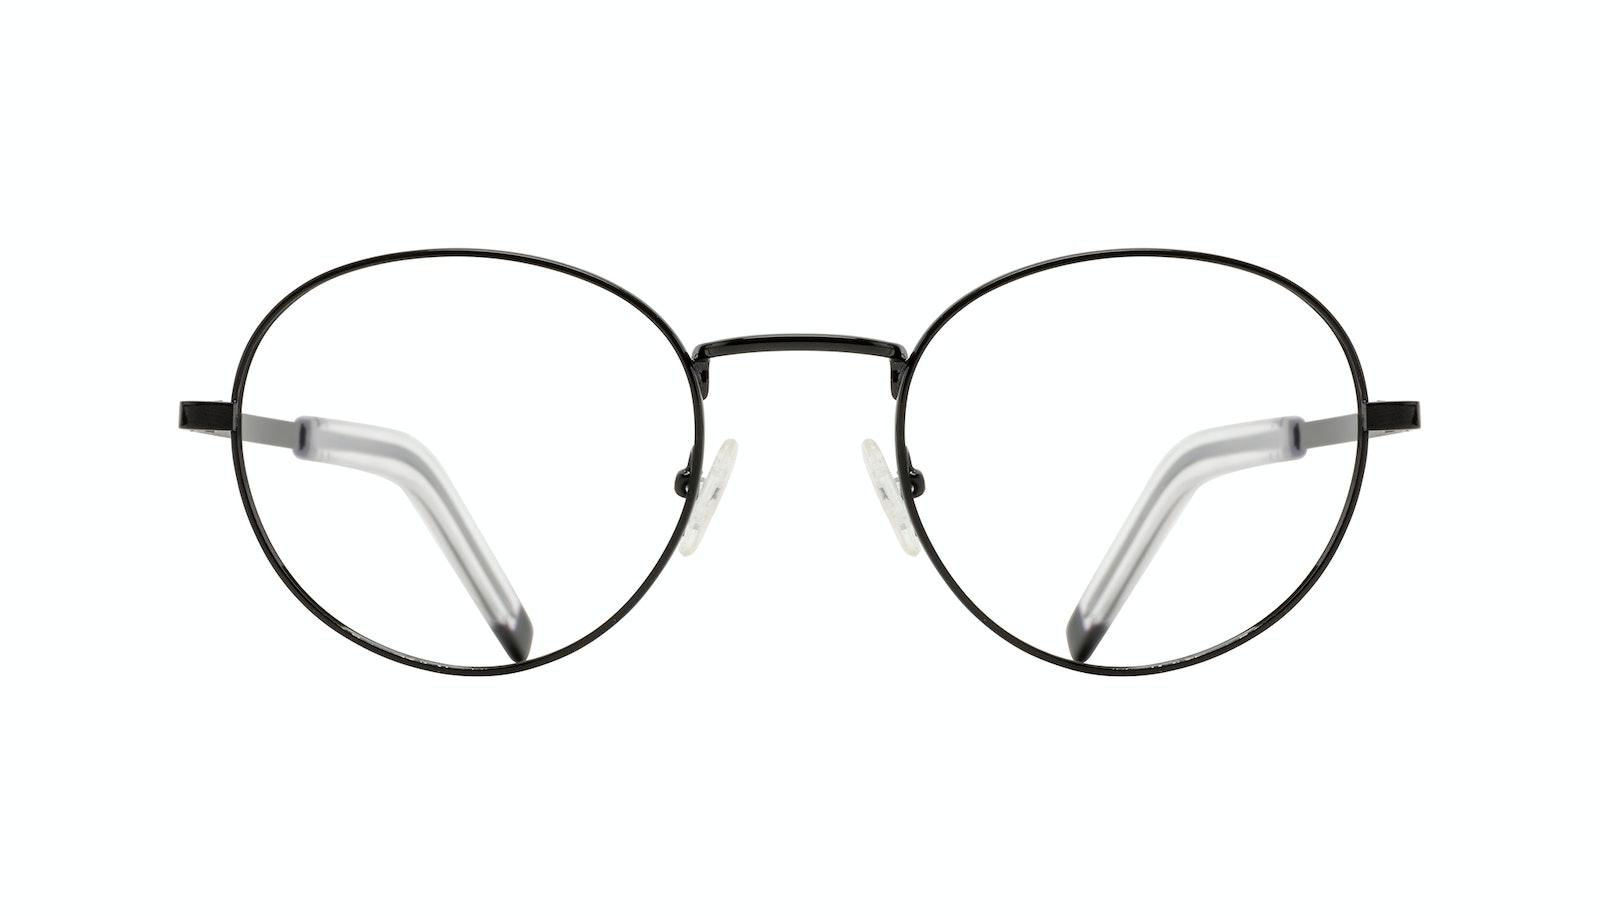 Affordable Fashion Glasses Round Eyeglasses Men Lean XL Black